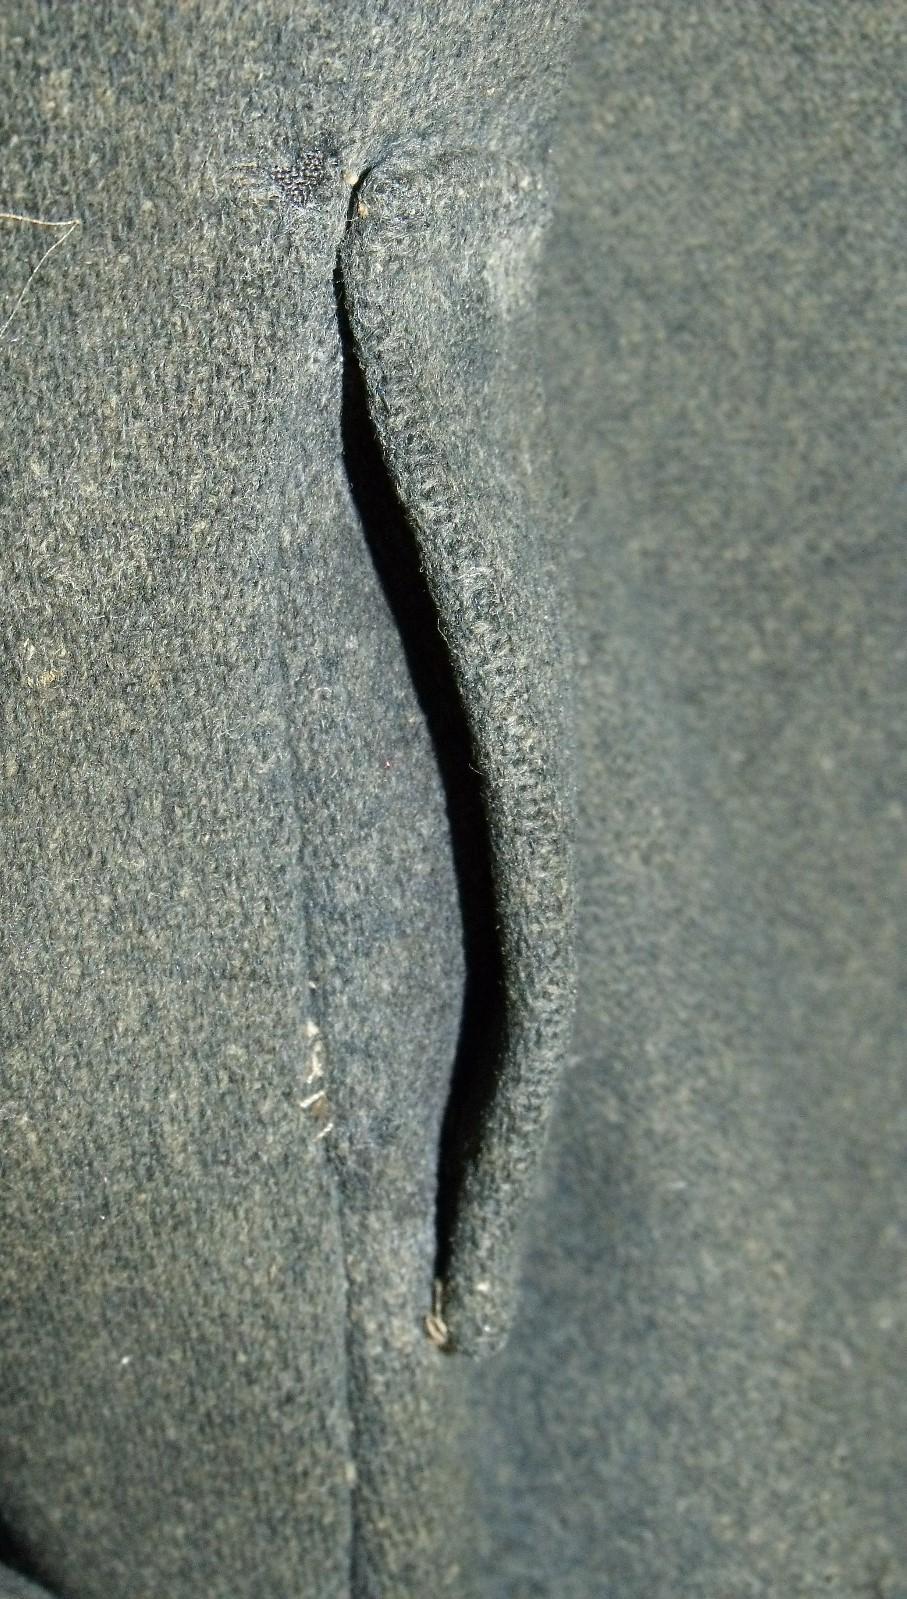 Gettysburg NPS jacket – slightly forward of side seam